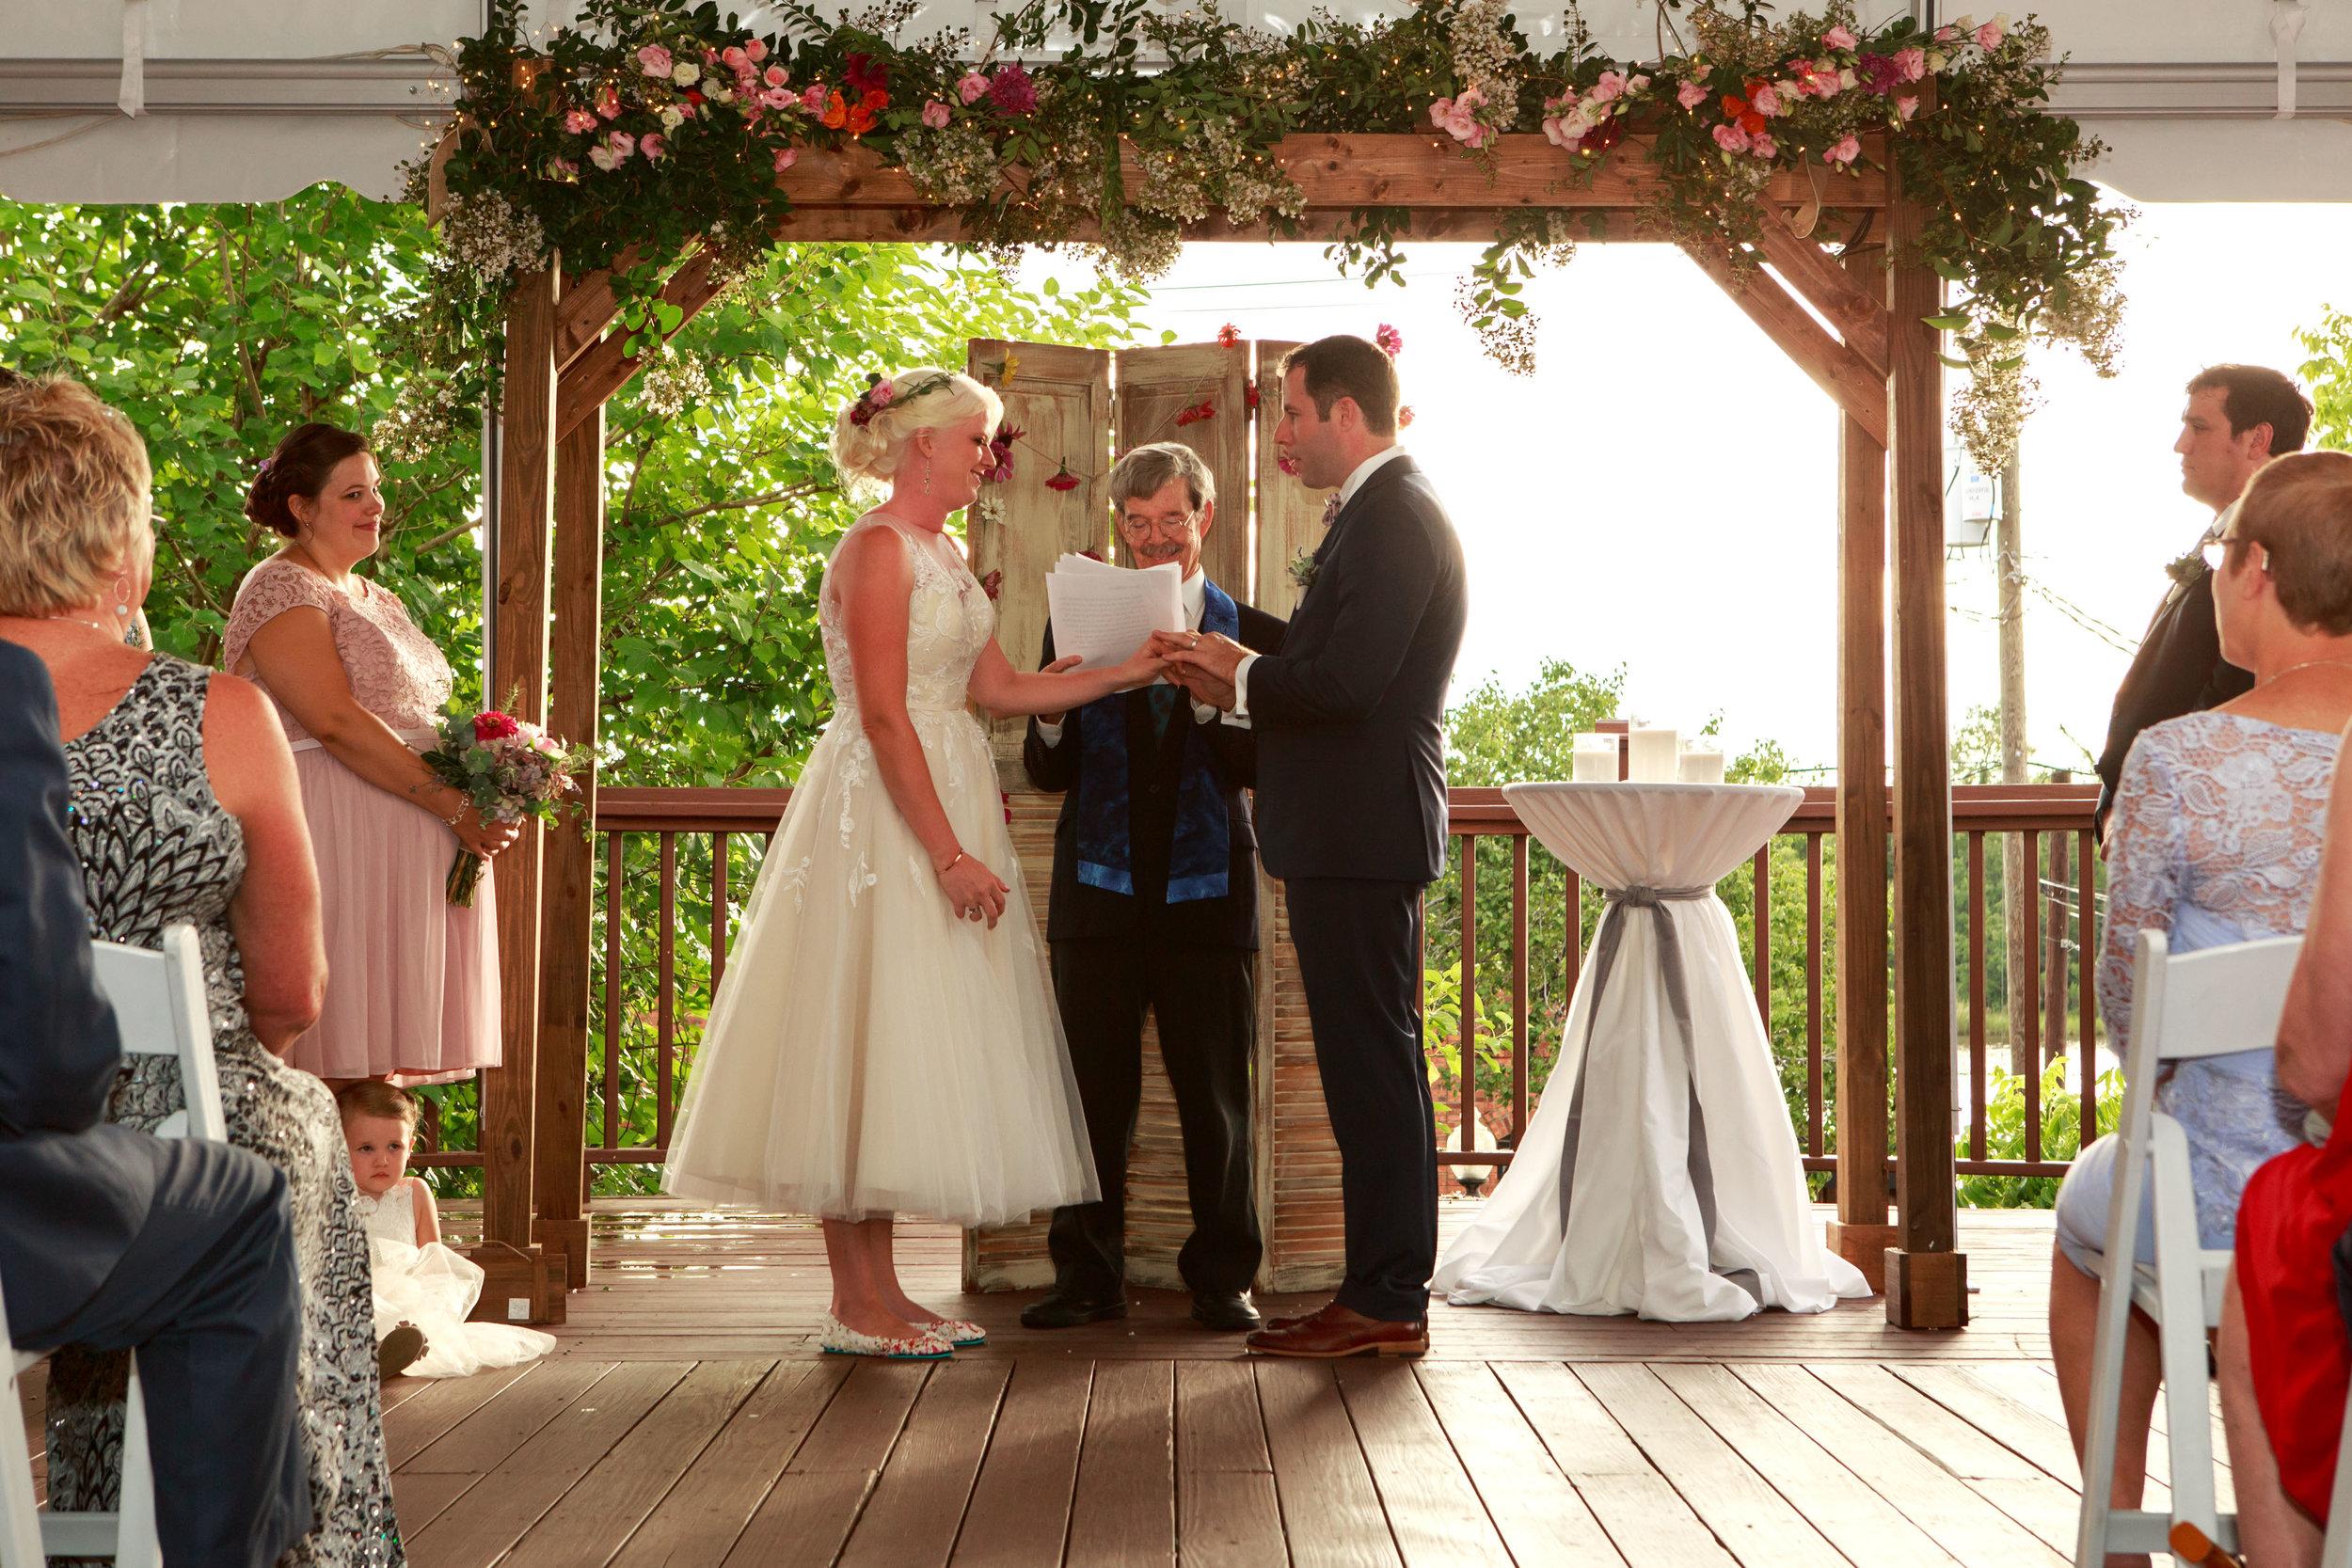 128-South-Wedding-Wilmington-NC-Photographer-Ceremony-23.13.jpg